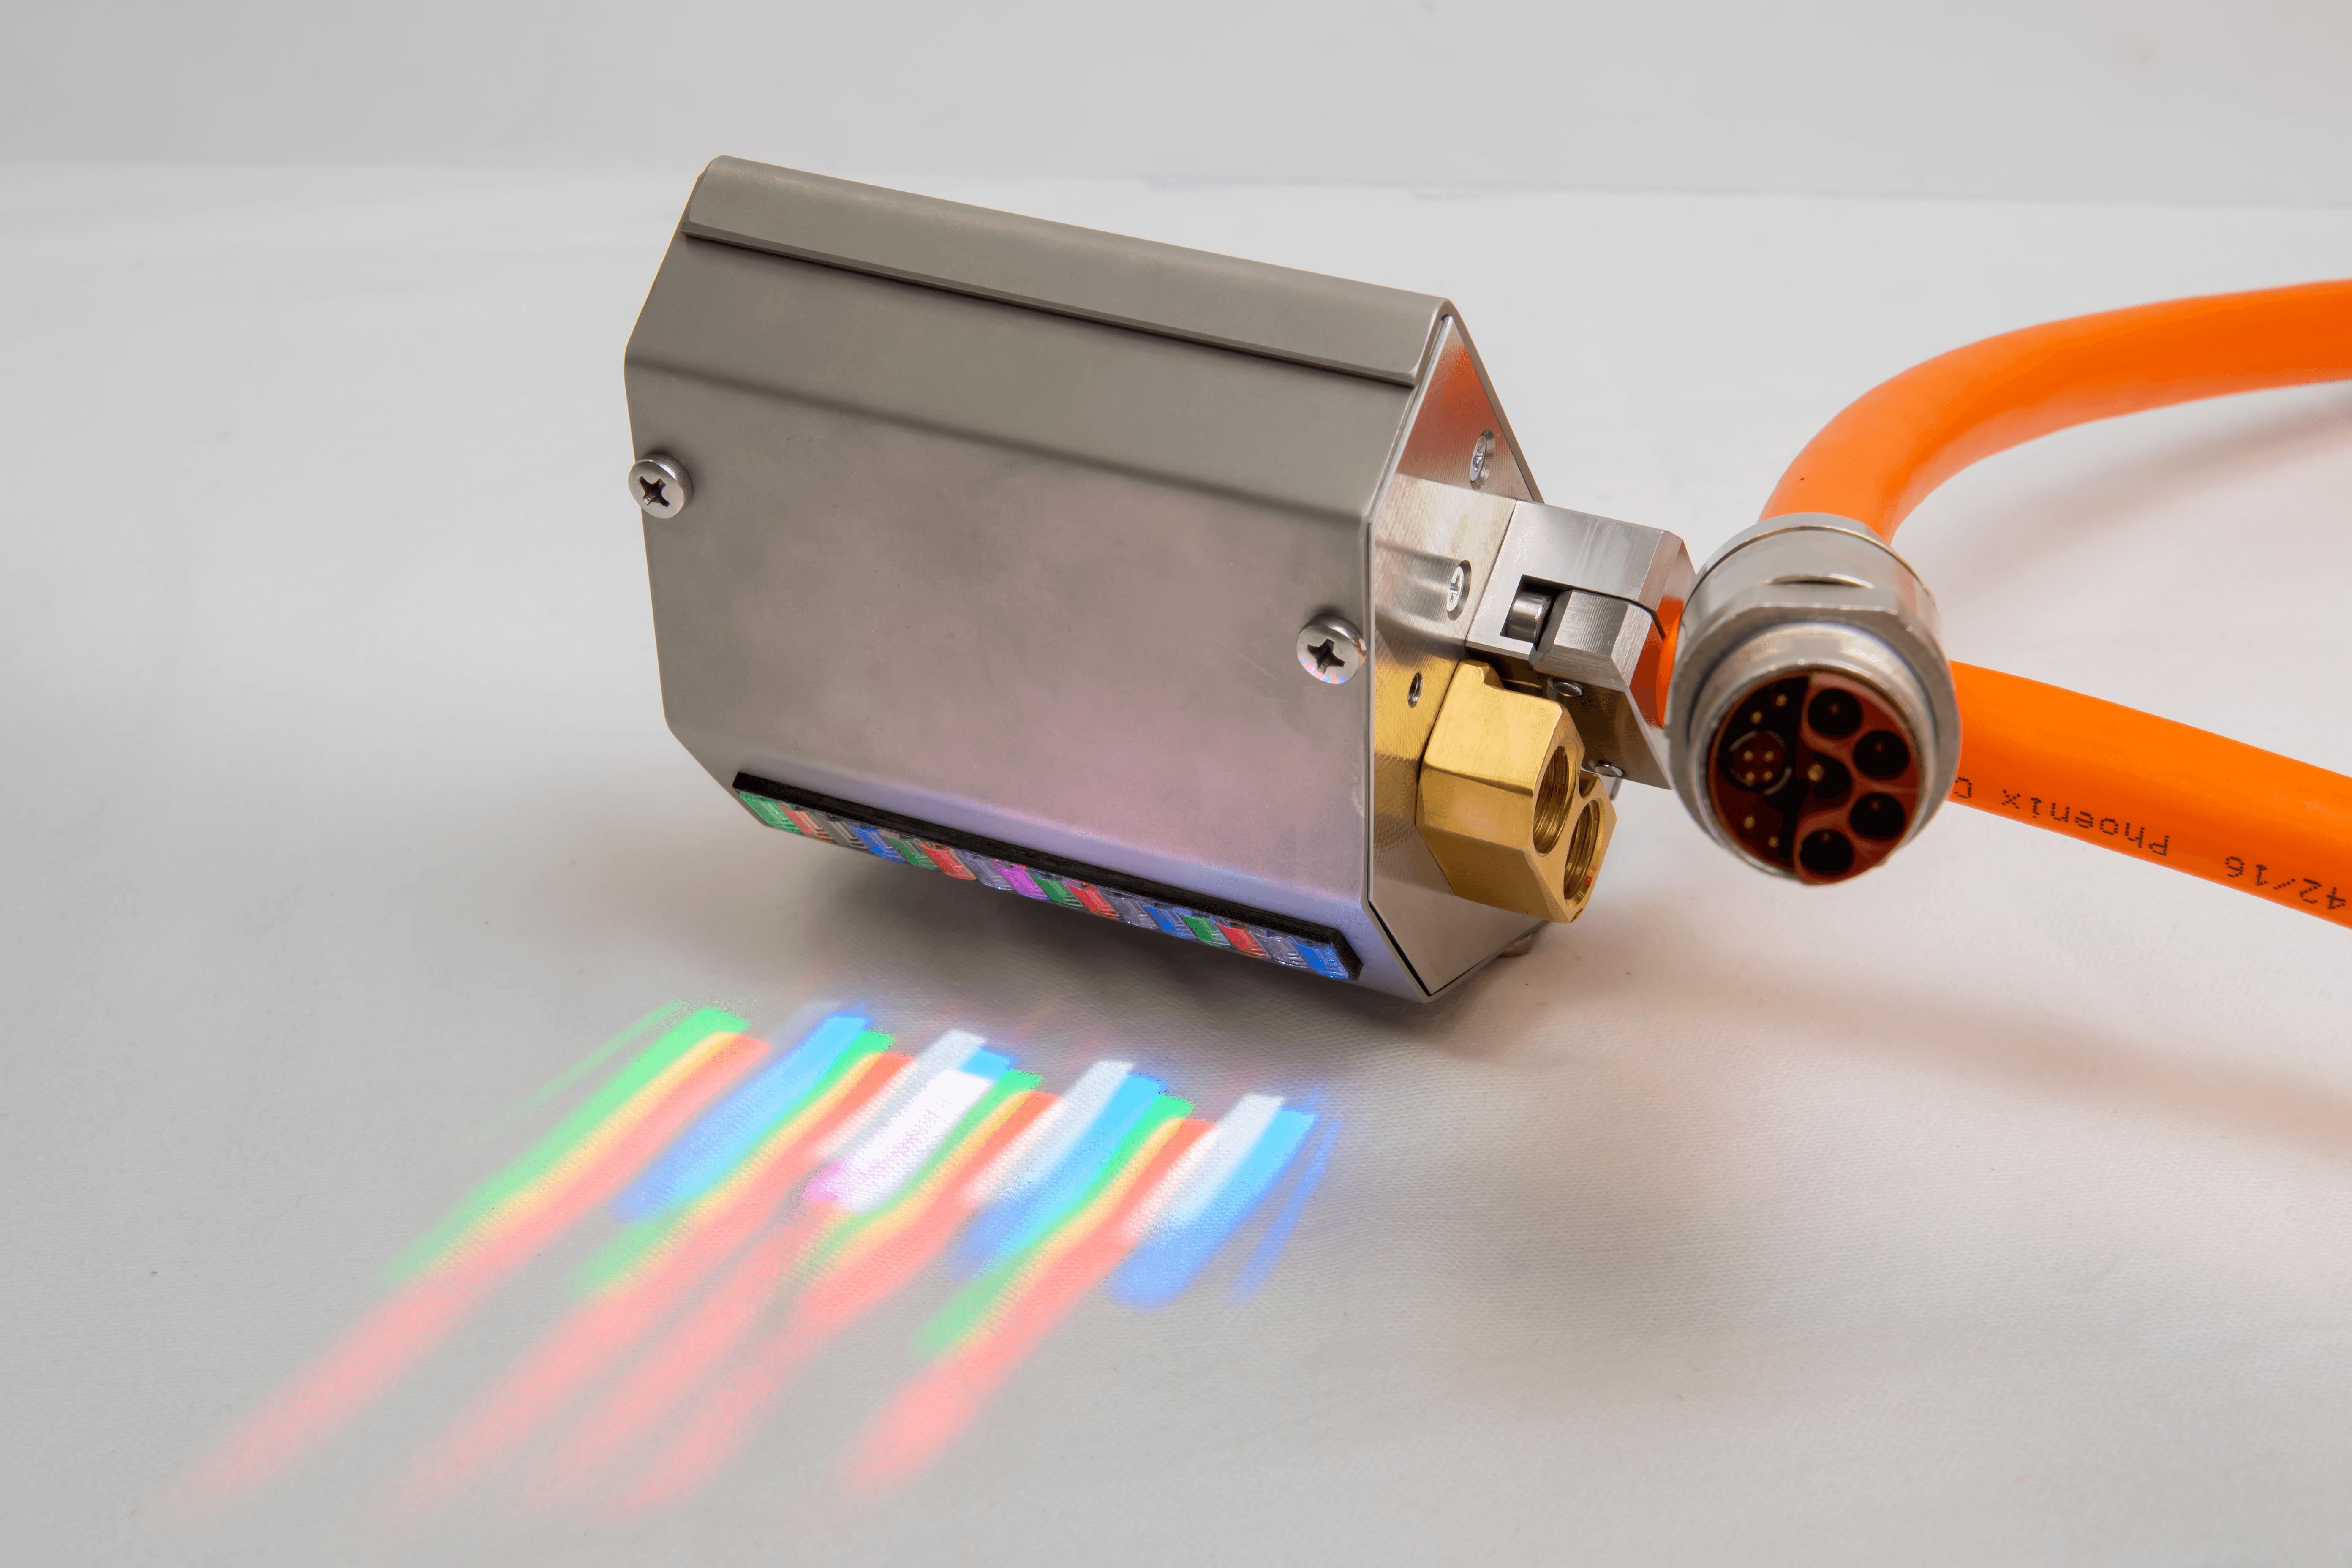 RGB illumination for substance detection